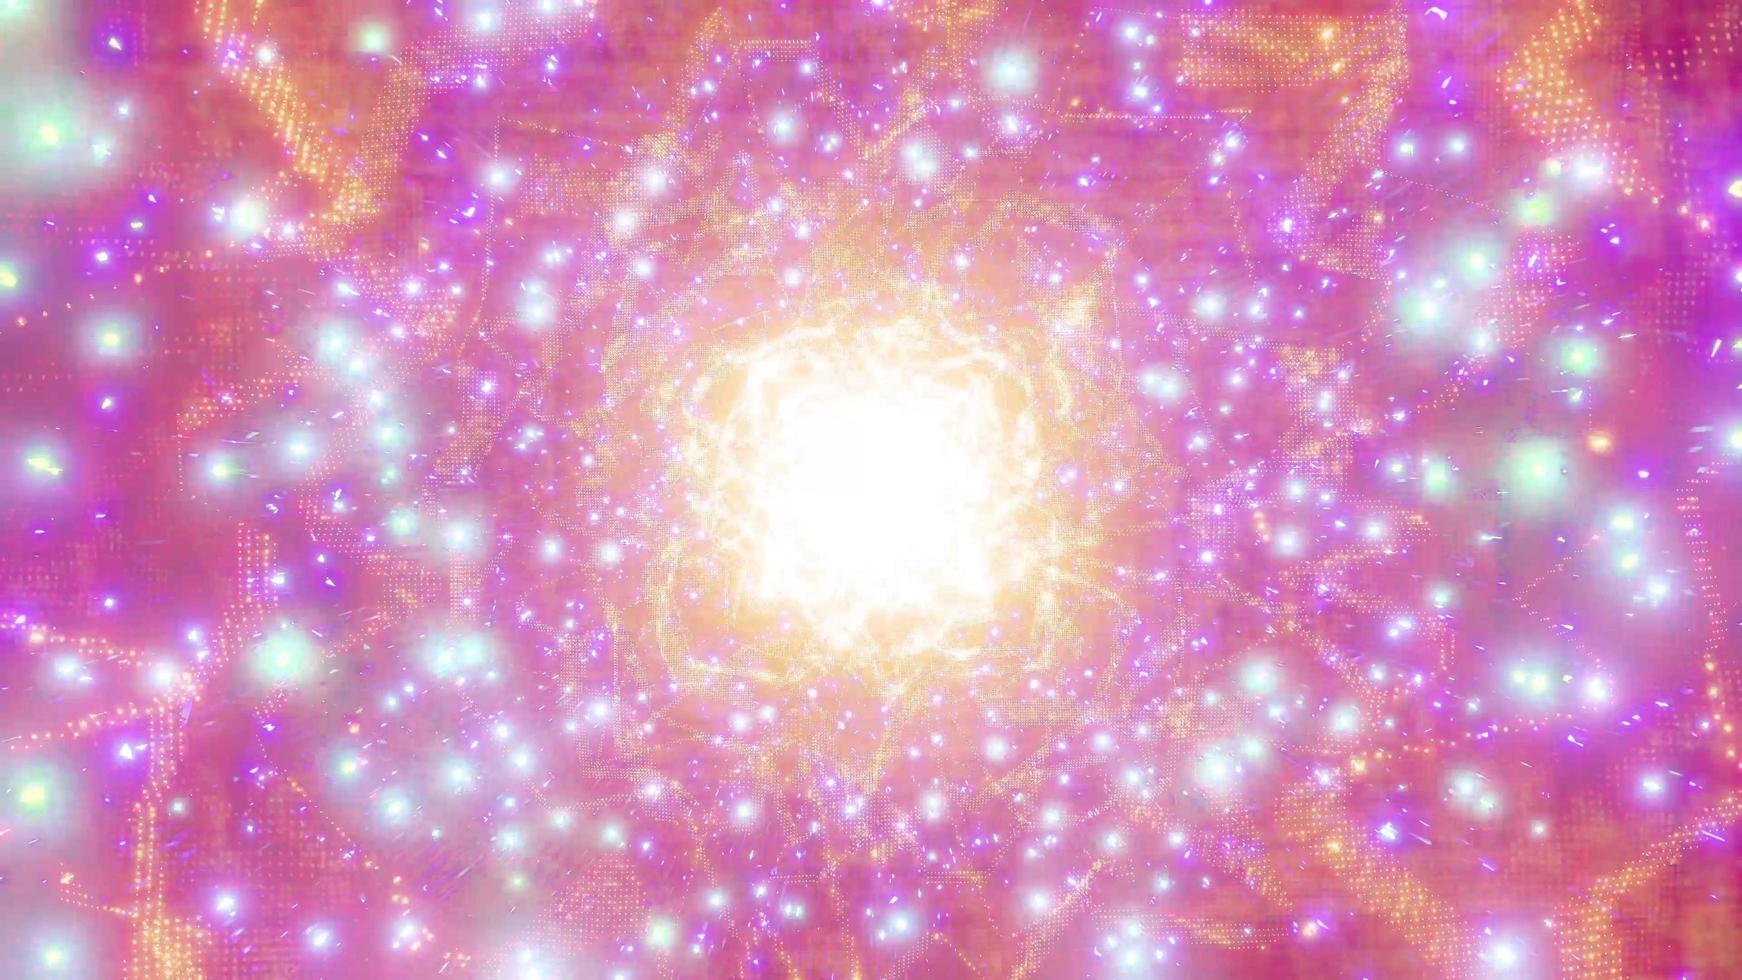 orange ljus glödande sci-fi rymdpartikel galax 3d illustration bakgrund tapet design konstverk foto